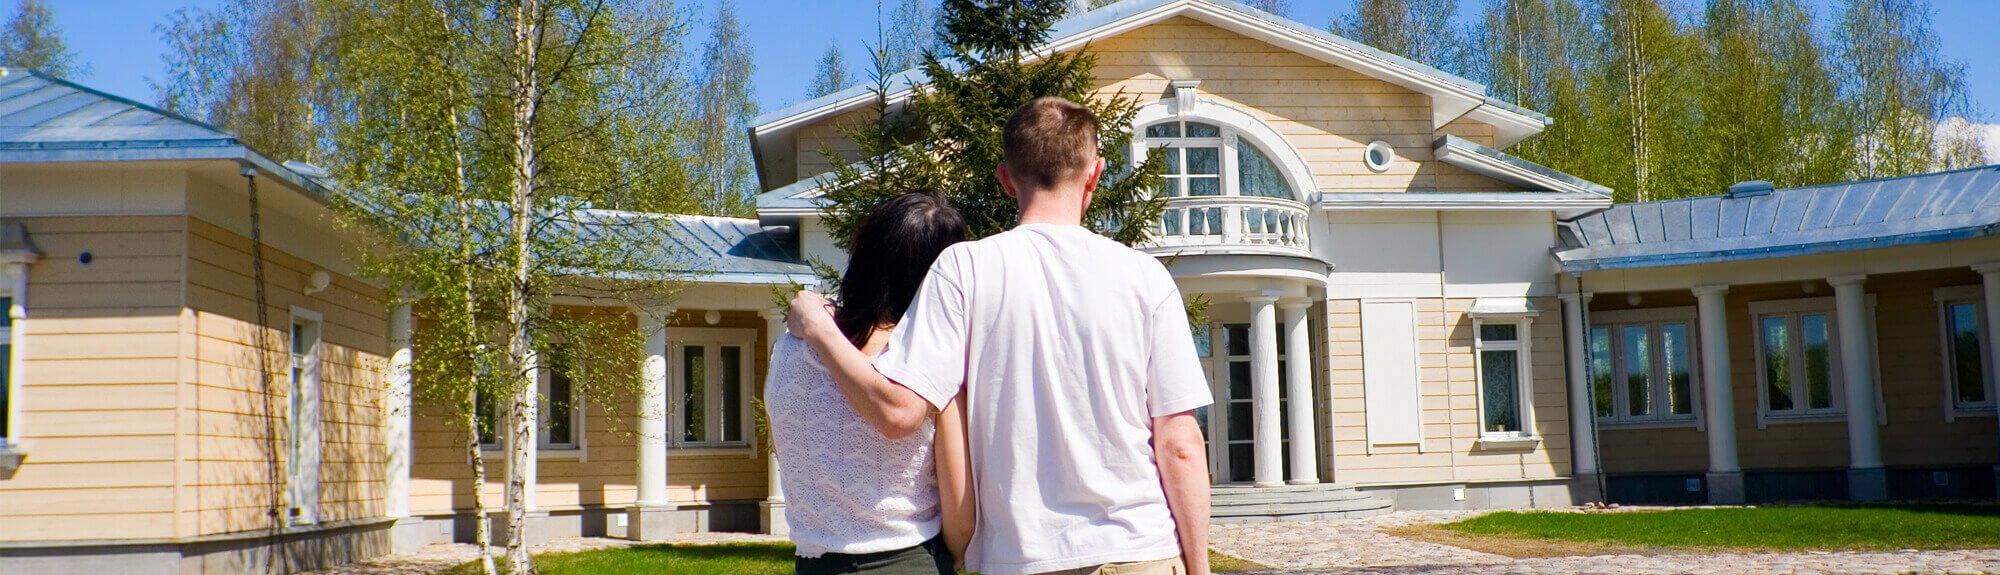 absolute home loan services llc orlando home loans orlando